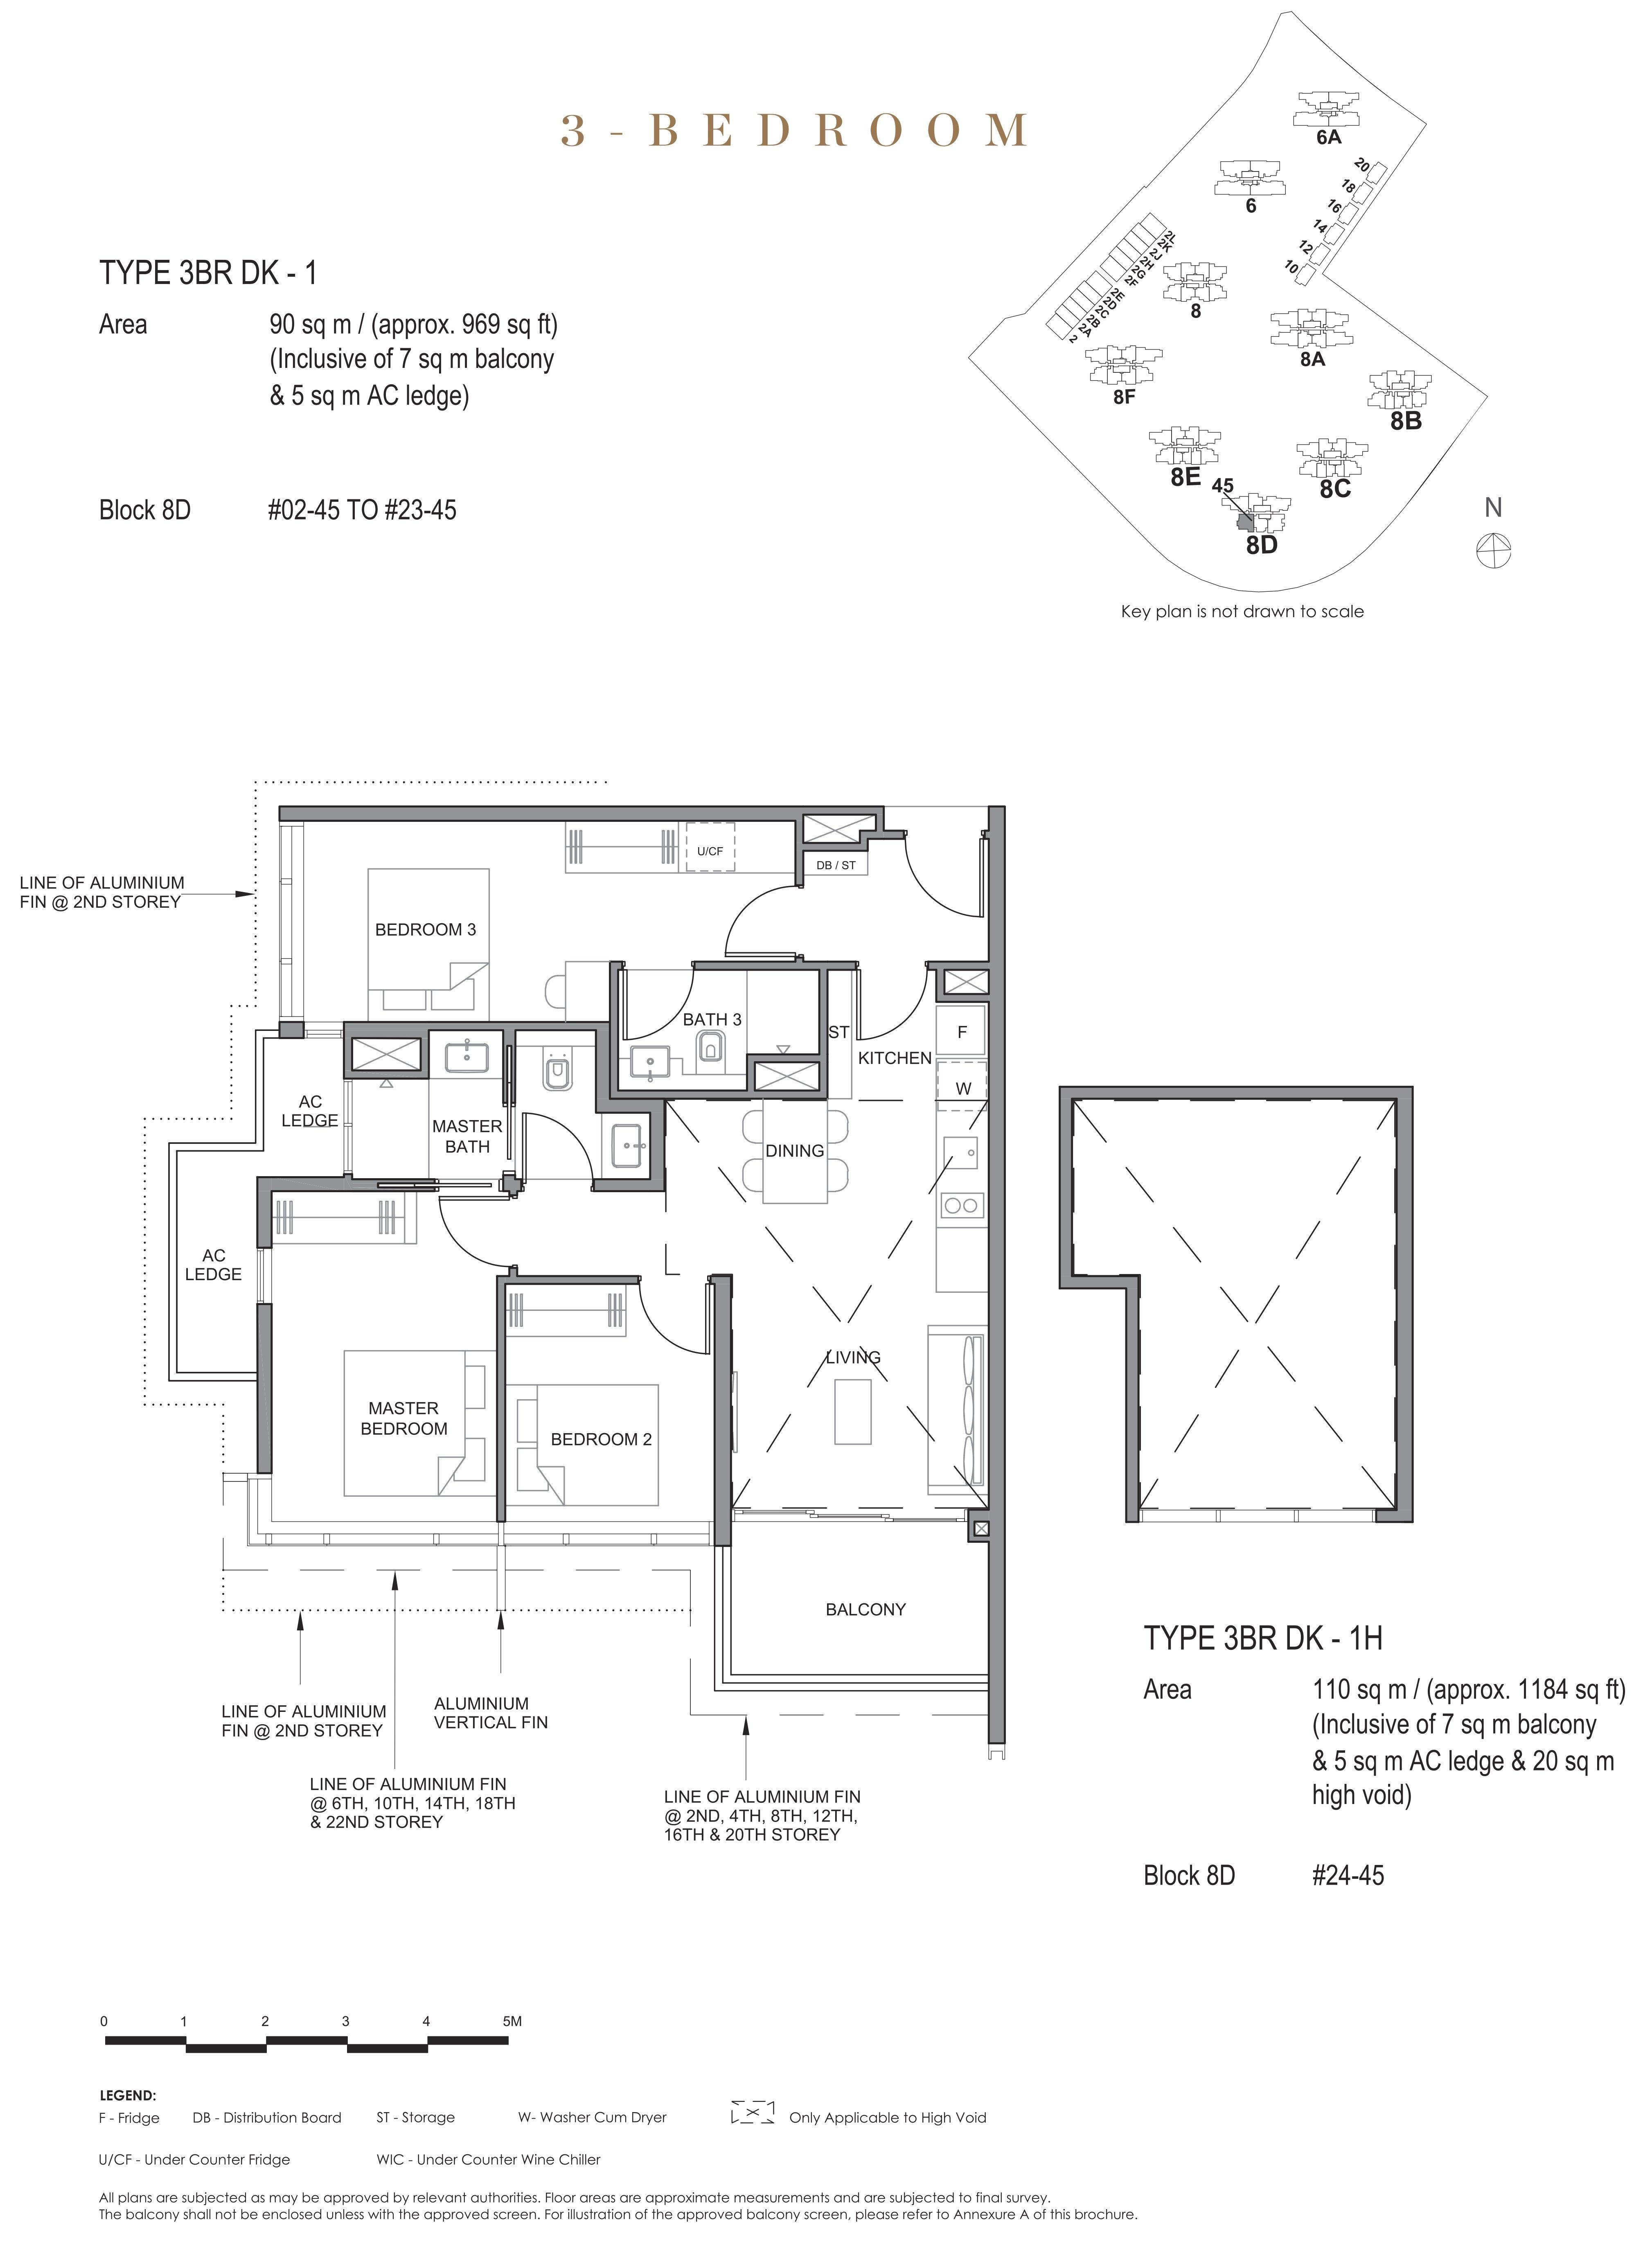 Parc Clematis 锦泰门第 contemporary 3 bedroom dk 3卧房-双钥匙 3BR-dk1